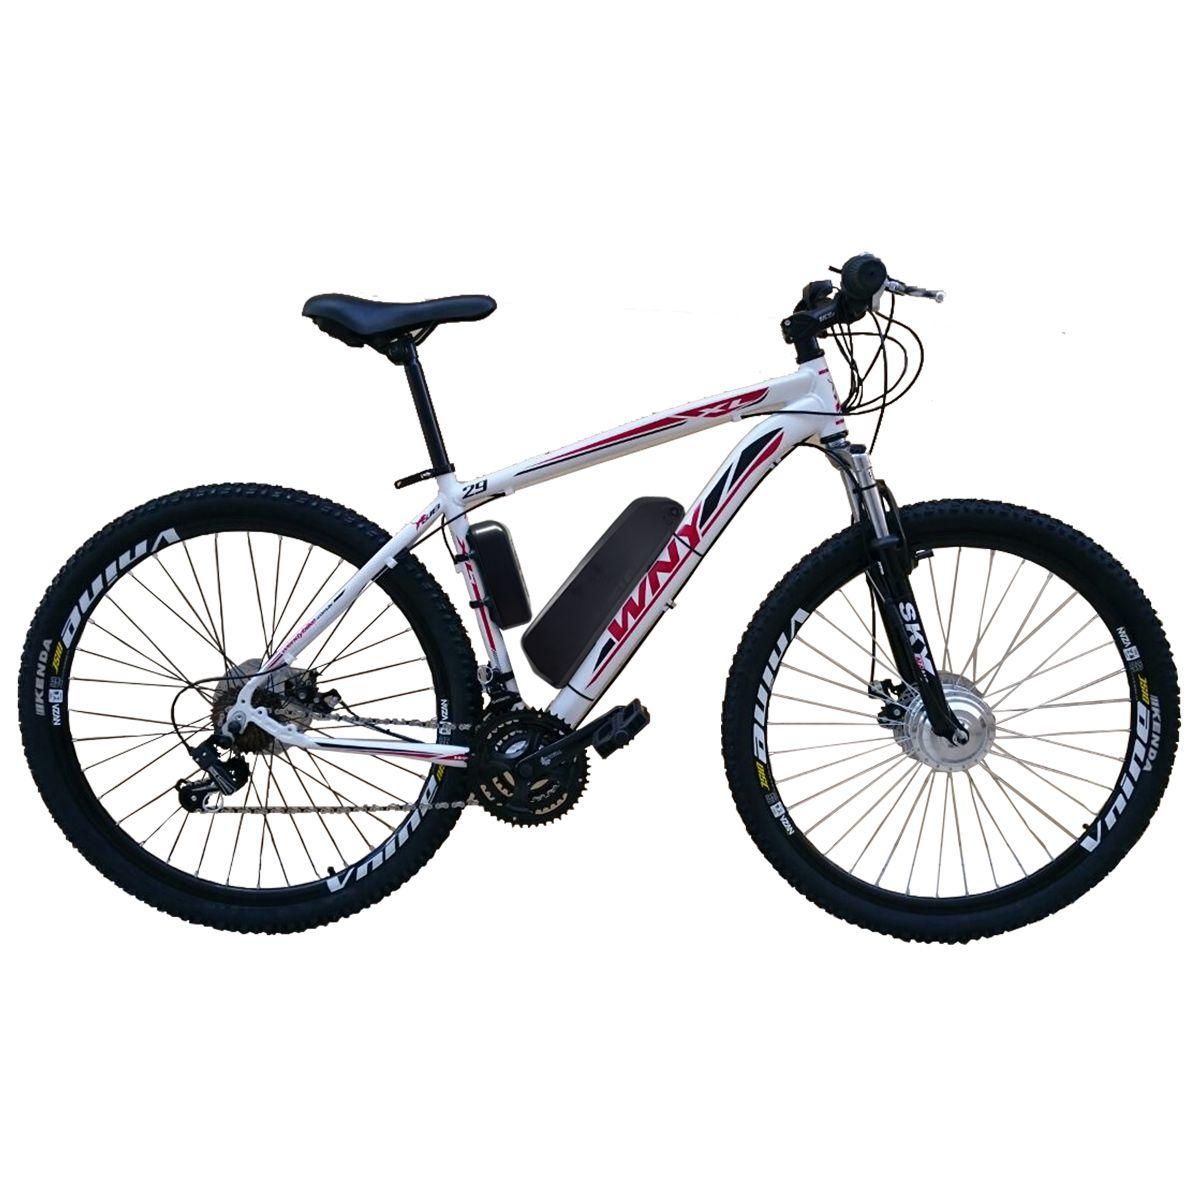 Bicicleta Elétrica Aro 29 Alumínio Bateria de LITIO TecUltra - 500 watts